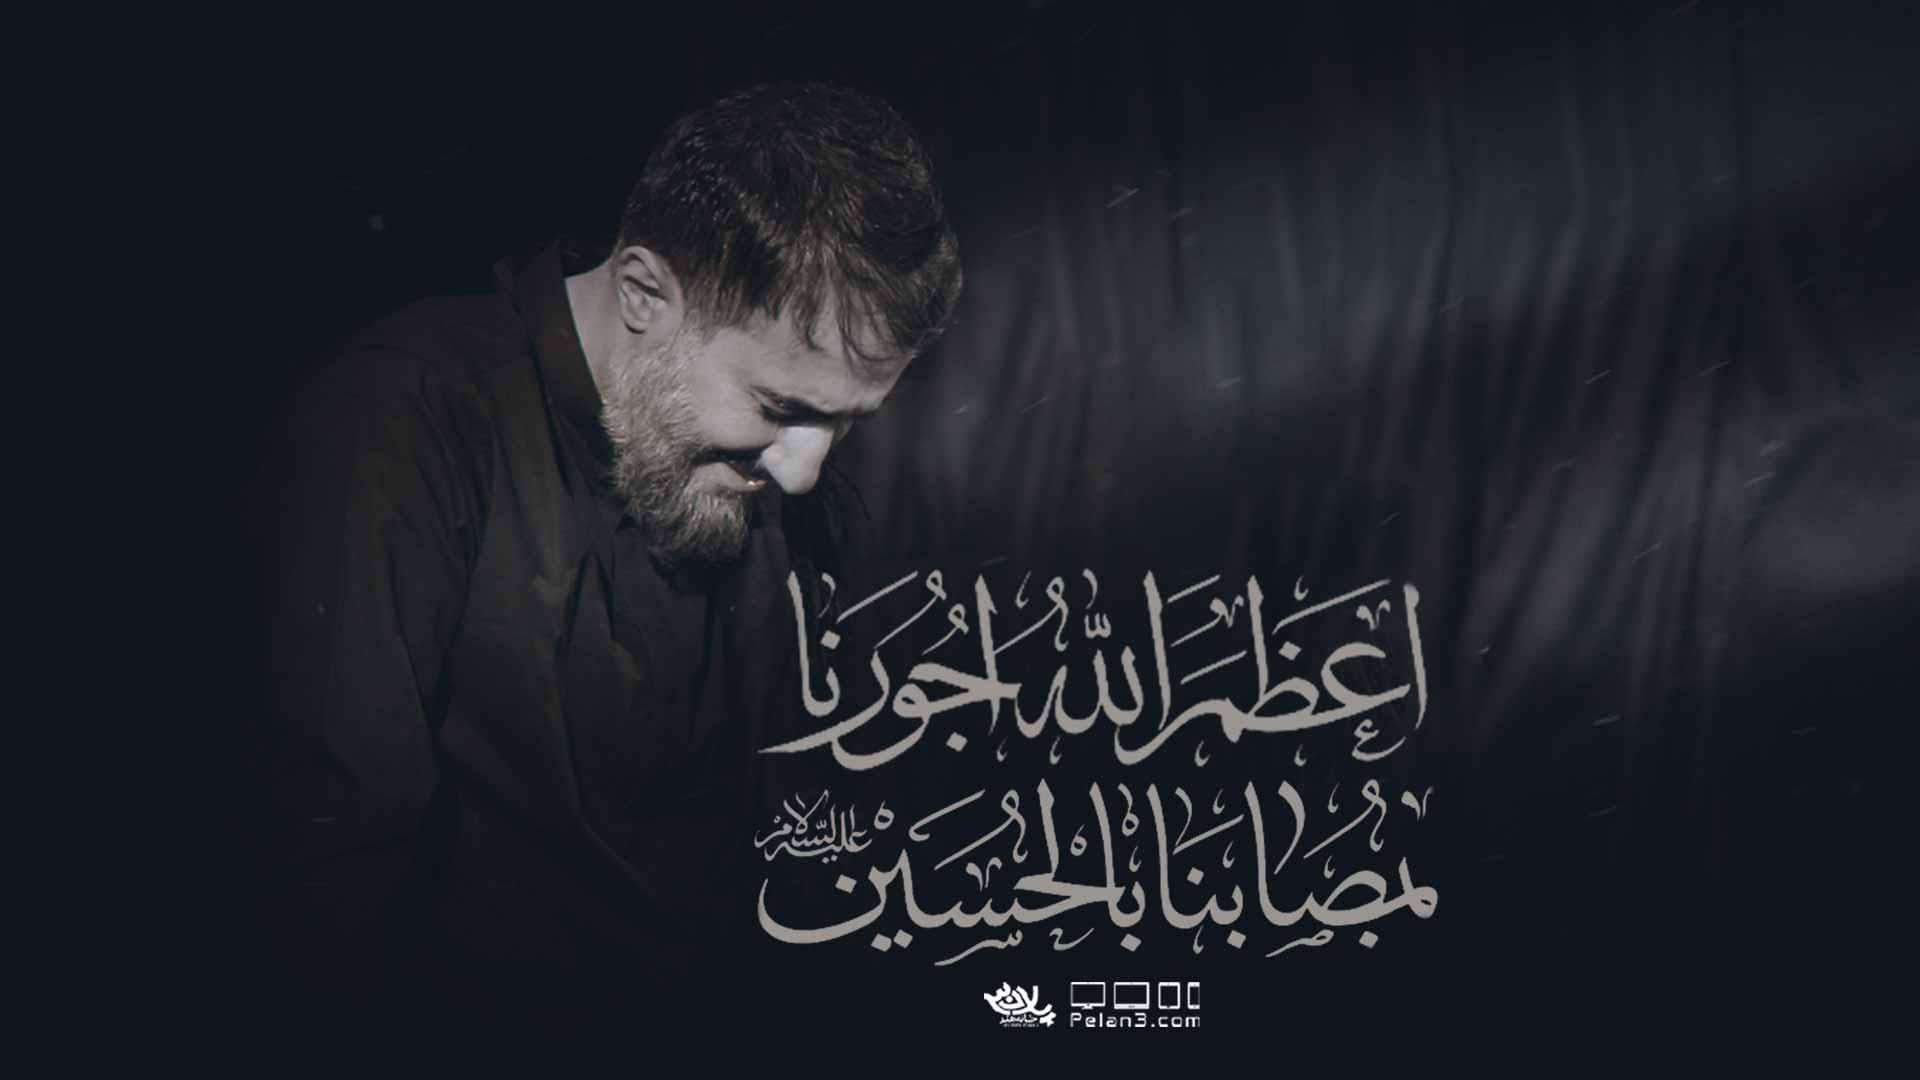 اعظم الله اجورنا محمدحسین پویانفر